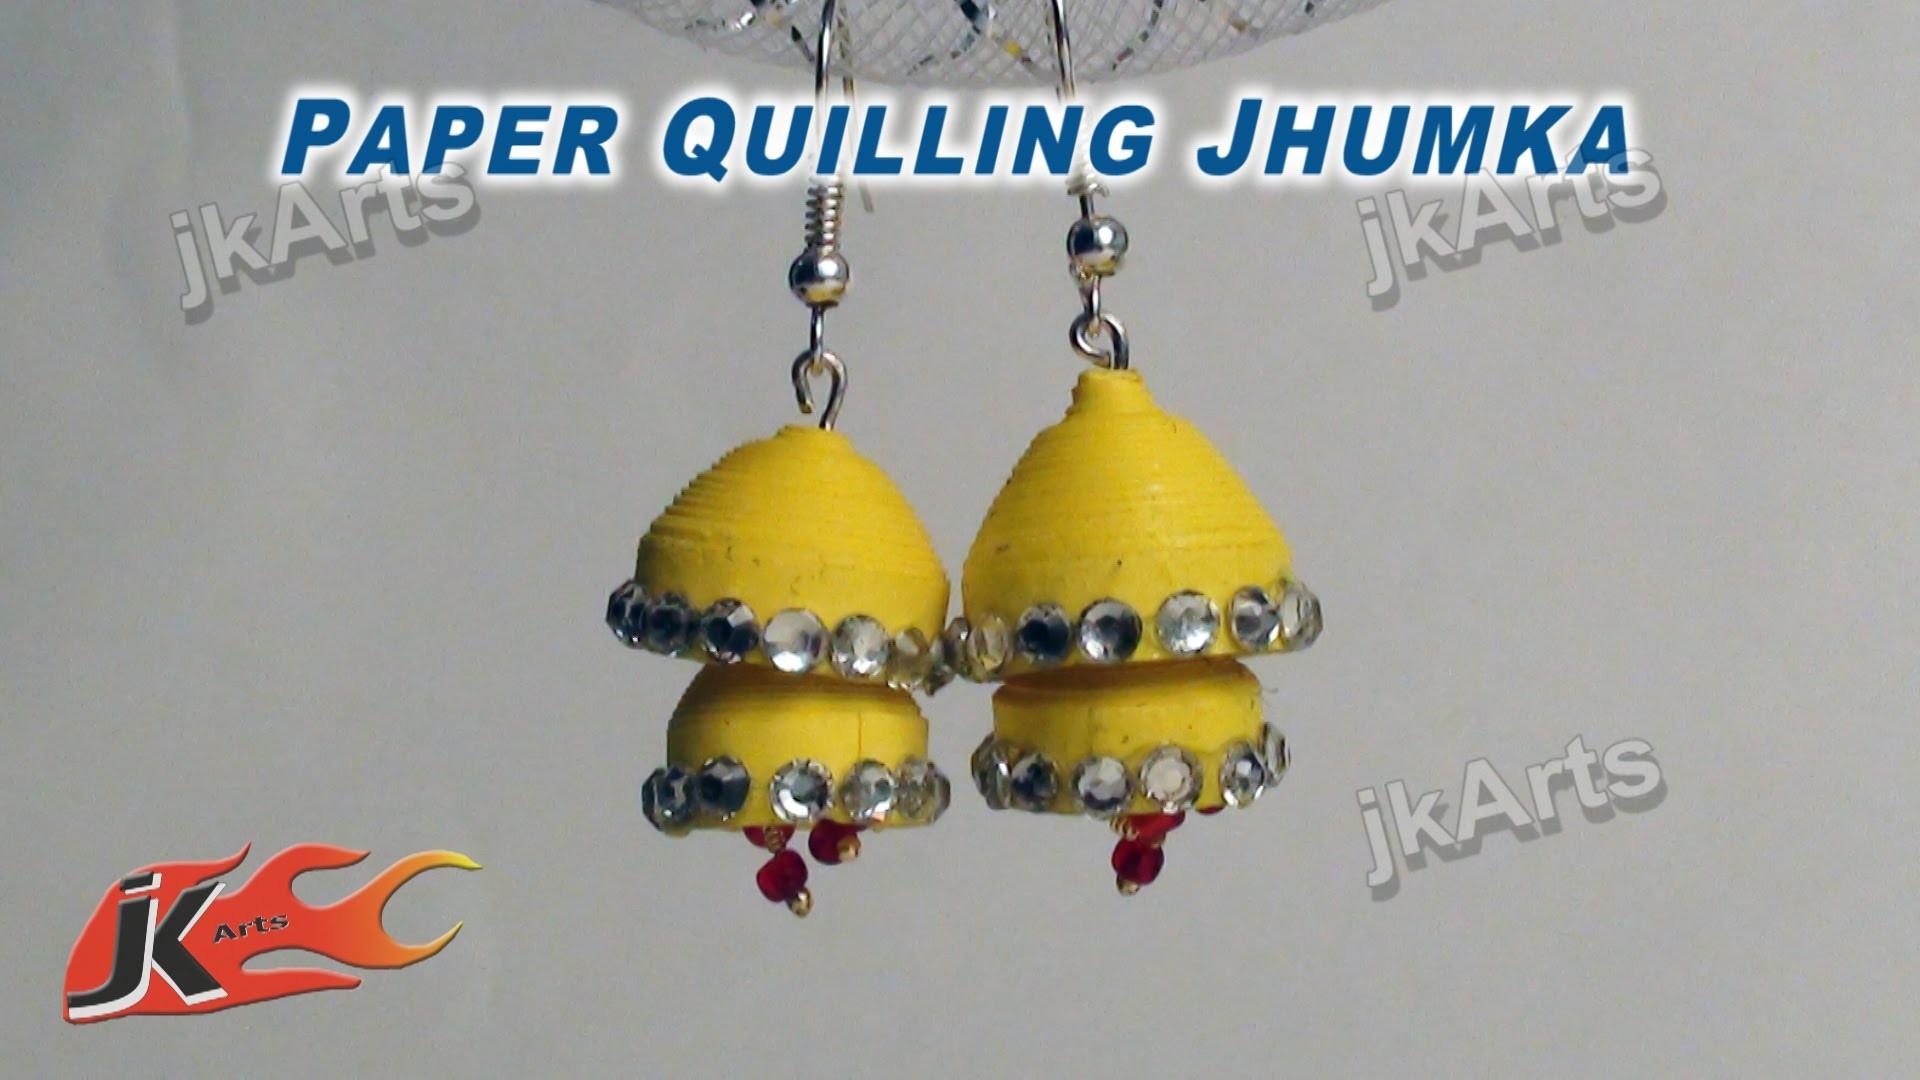 DIY How to make Paper Quilling Jhumka - JK Arts  340